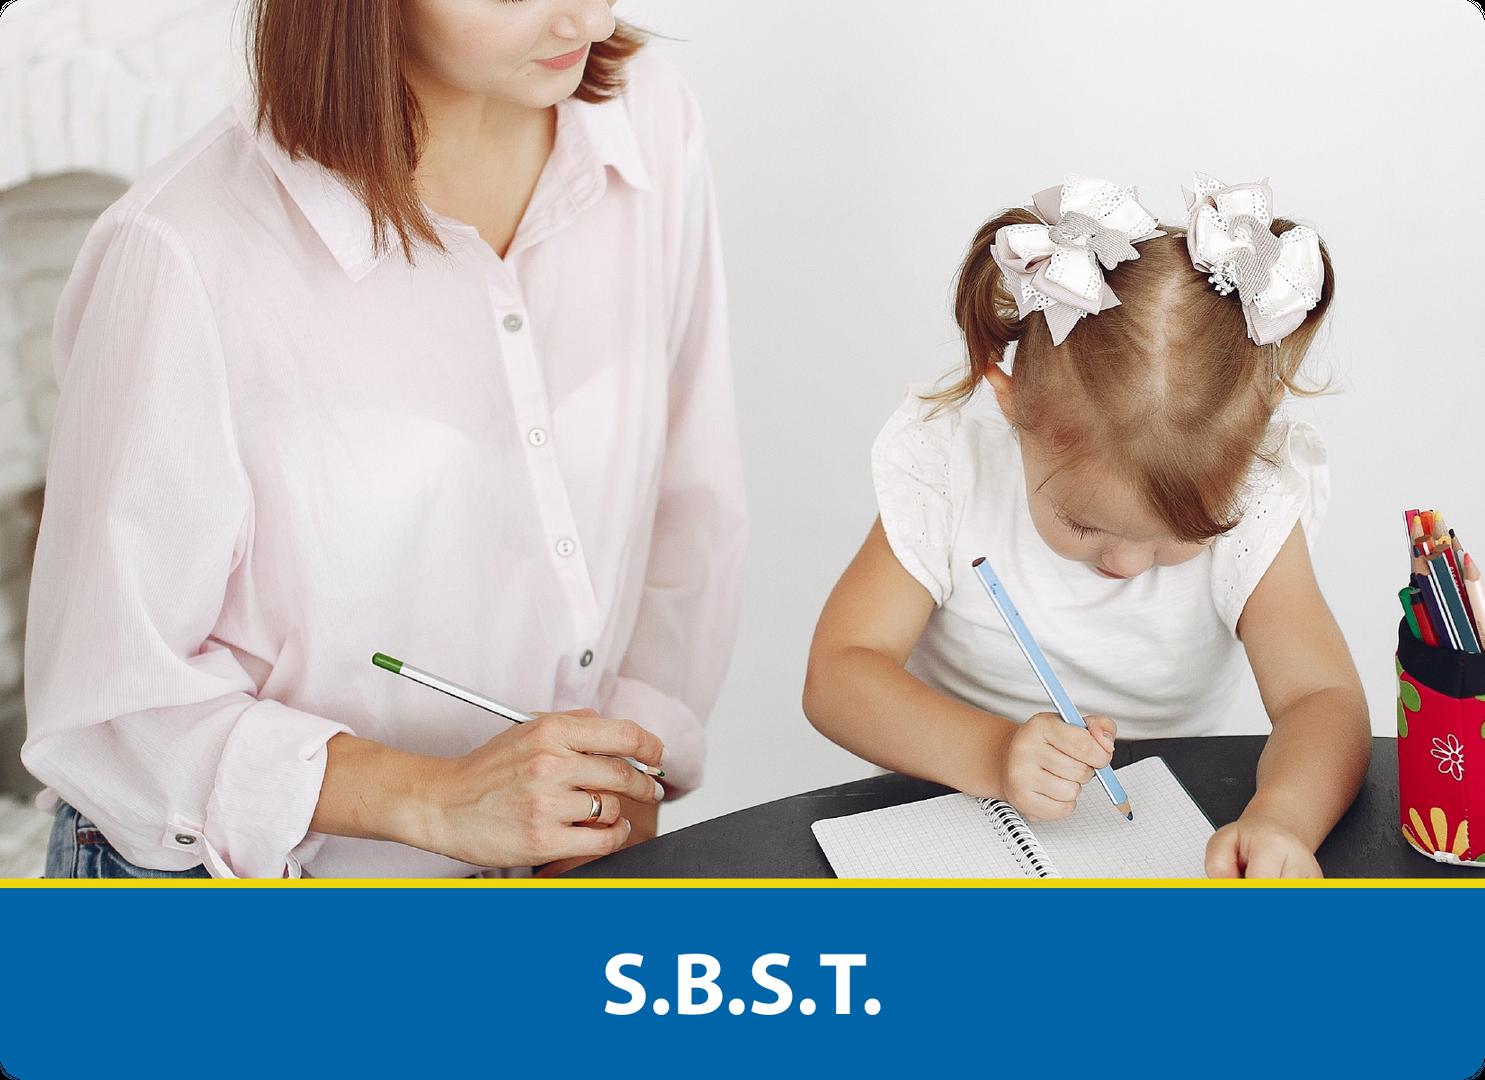 S.B.S.T.: Teacher looking over student working